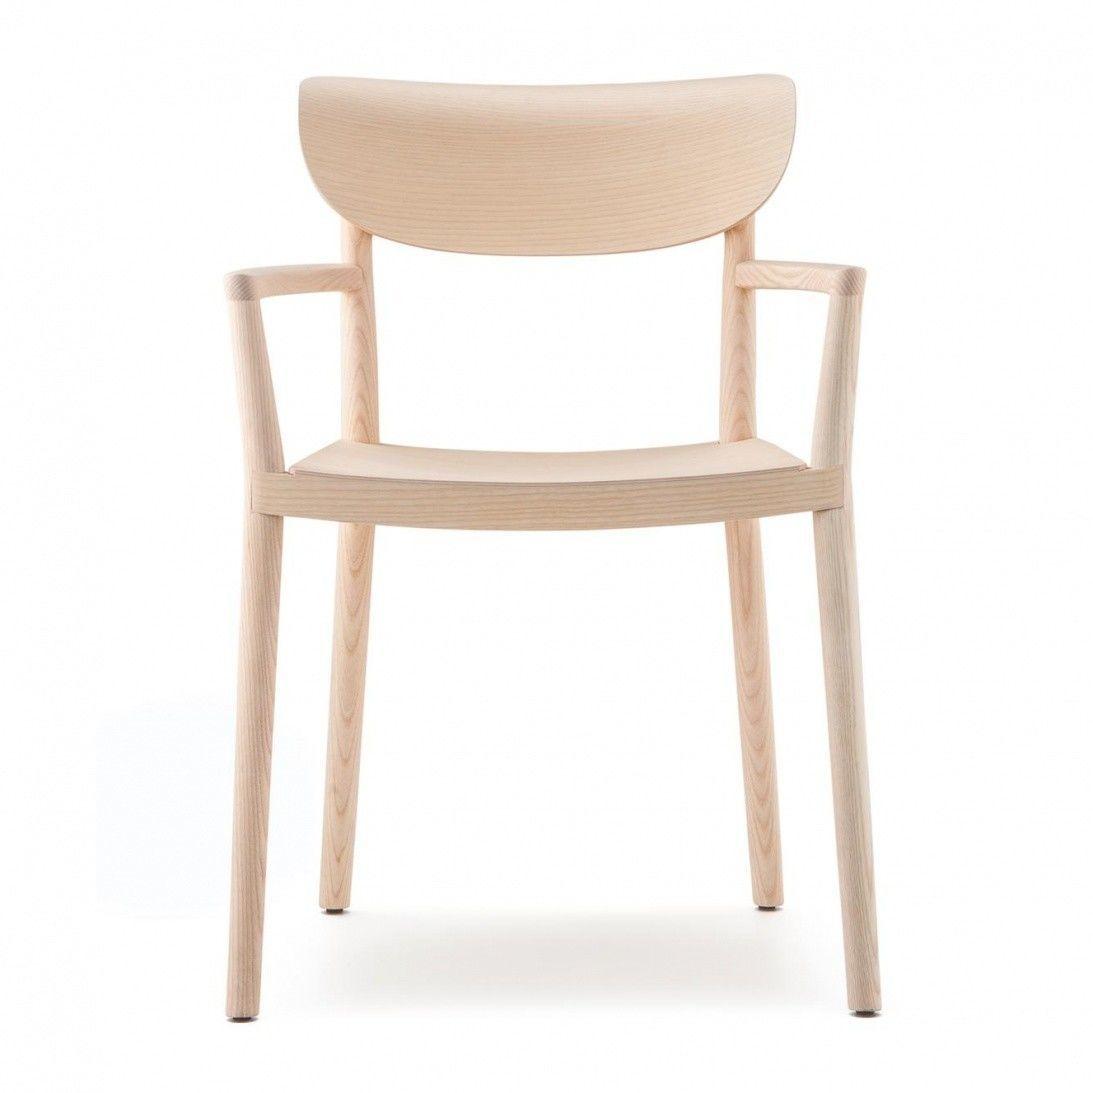 Tivoli 2805 chaise avec accoudoirs pedrali for Chaise pedrali